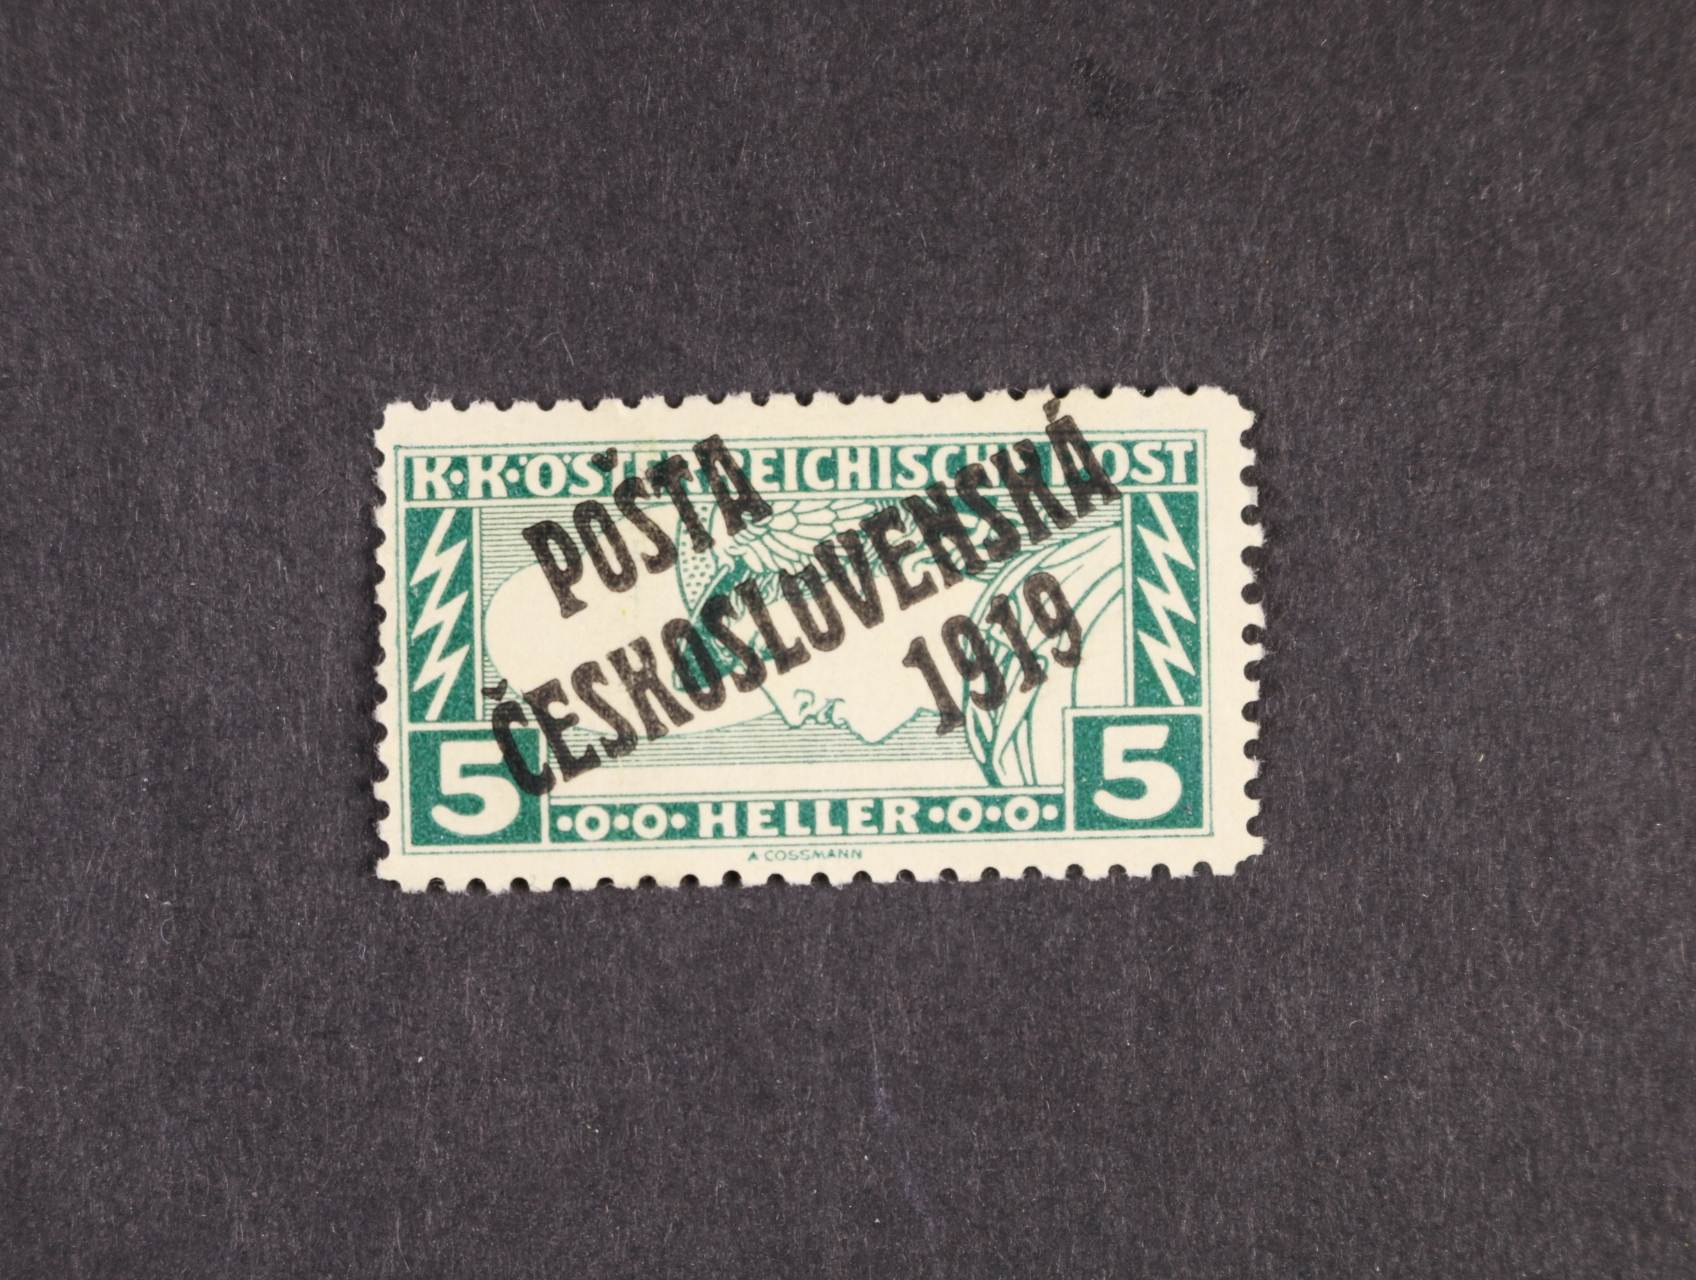 zn. č. 58 C, typ III, DV přetisku vyštípnuté druhé O v nápisu ČESKOSLOVENSKO, zk. Karásek